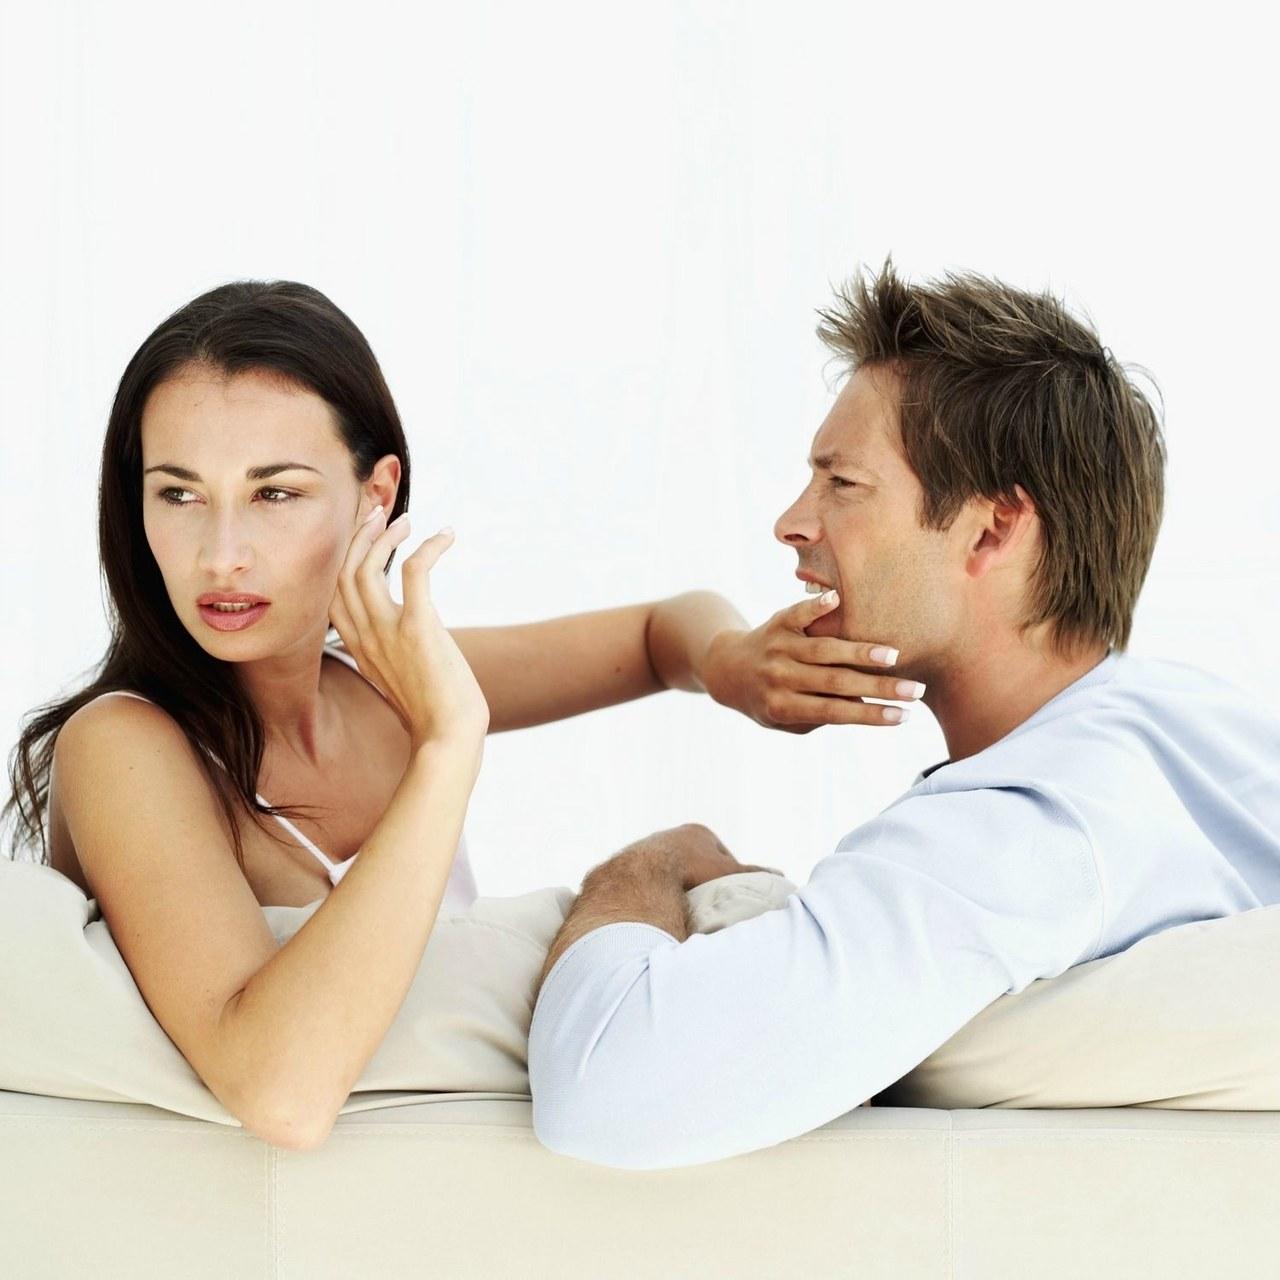 sex-love-life-2013-1-arguing-couple-main.jpg